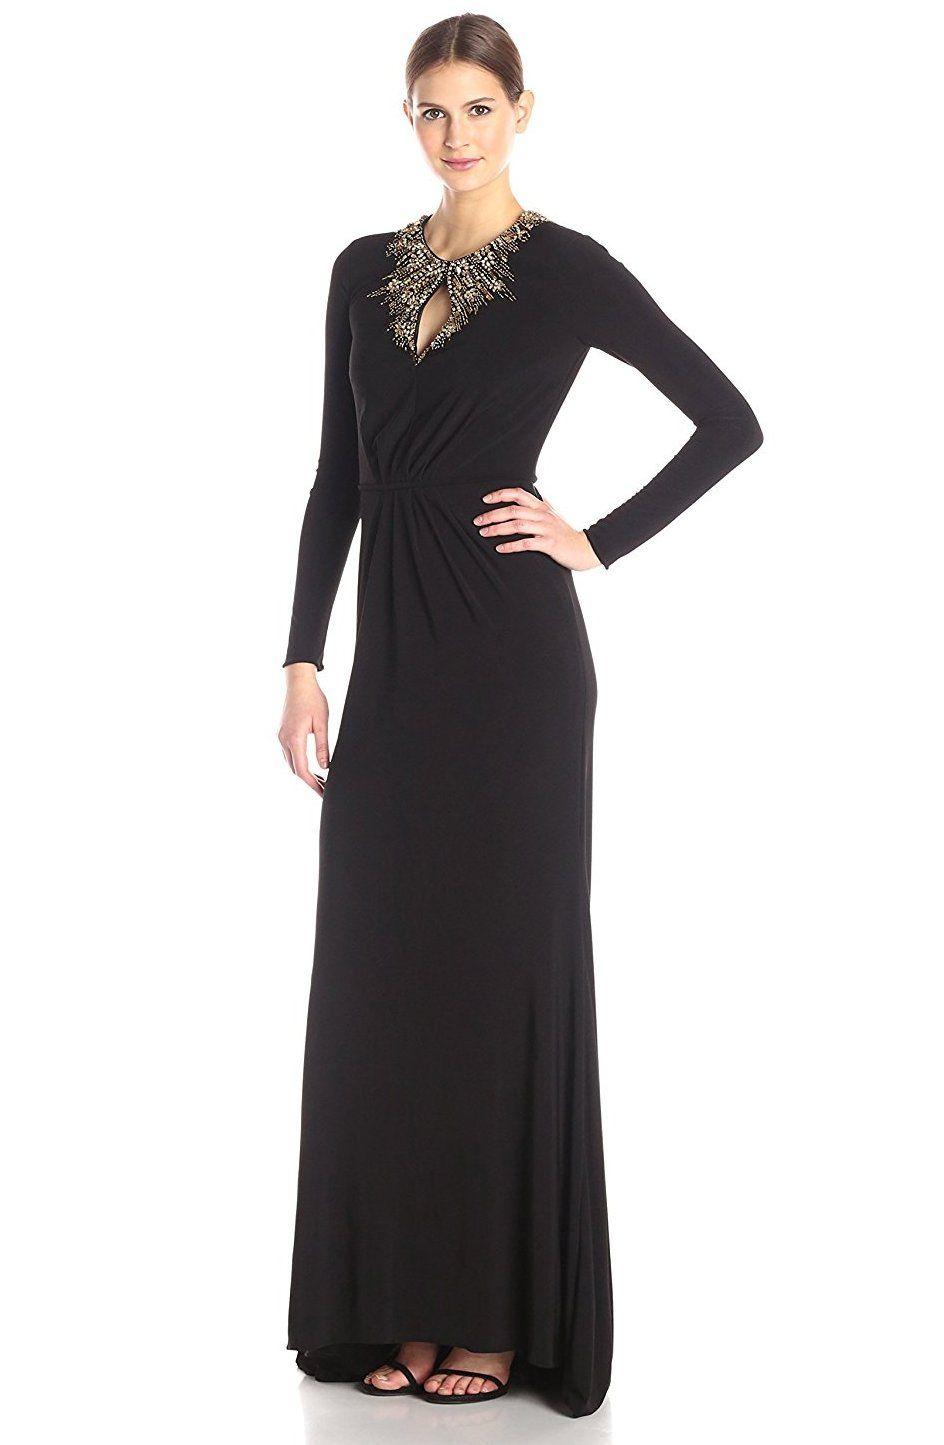 0a8f12370e6 Long Sleeve Black Maxi Dress Amazon - Gomes Weine AG